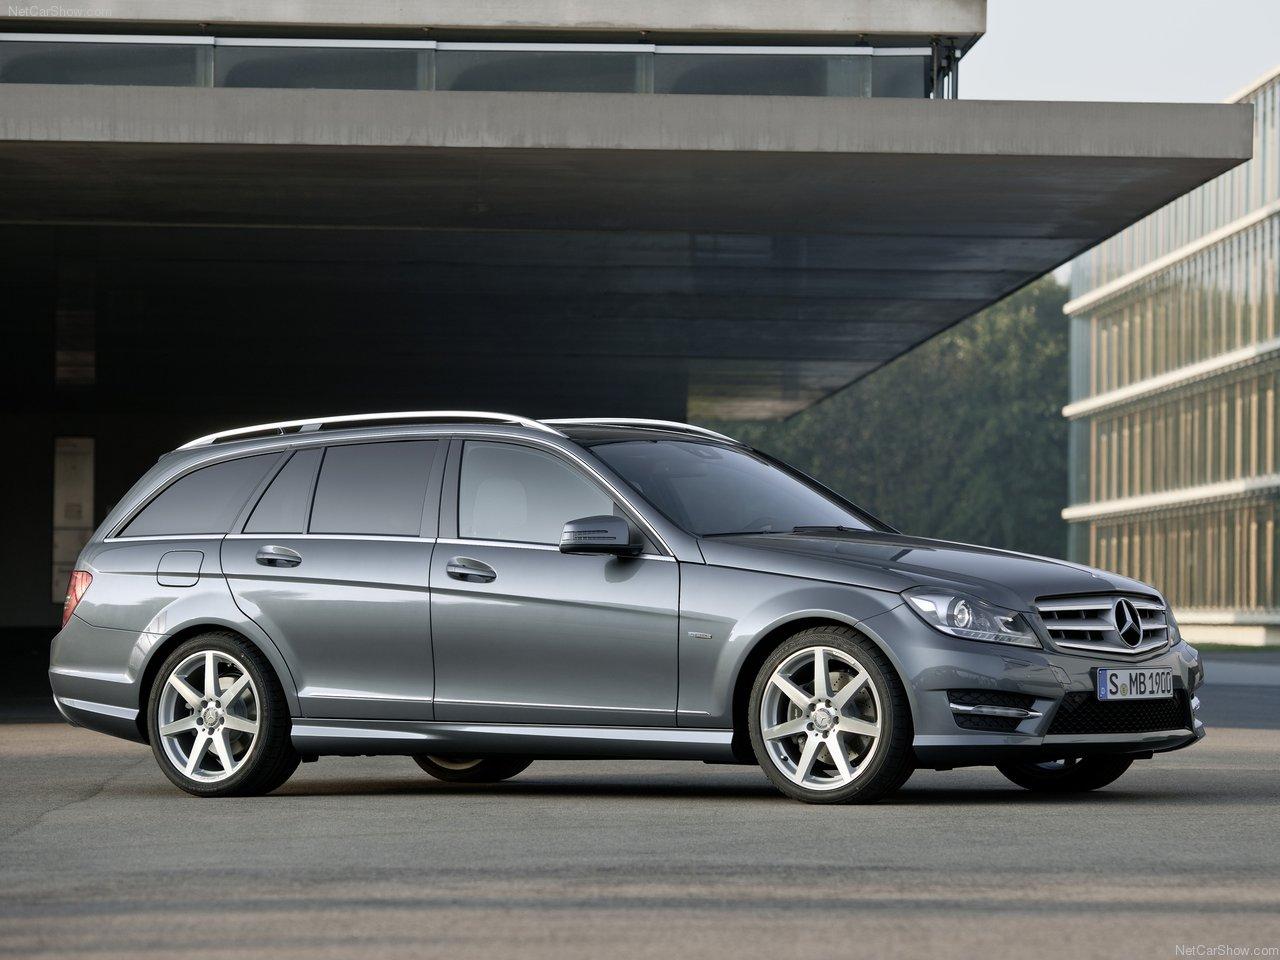 http://1.bp.blogspot.com/_lsyt_wQ2awY/TRNrLVPi_DI/AAAAAAACIYI/qnwSgzQI4iE/s1600/Mercedes-Benz-C-Class_Estate_2012_1280x960_wallpaper_06.jpg